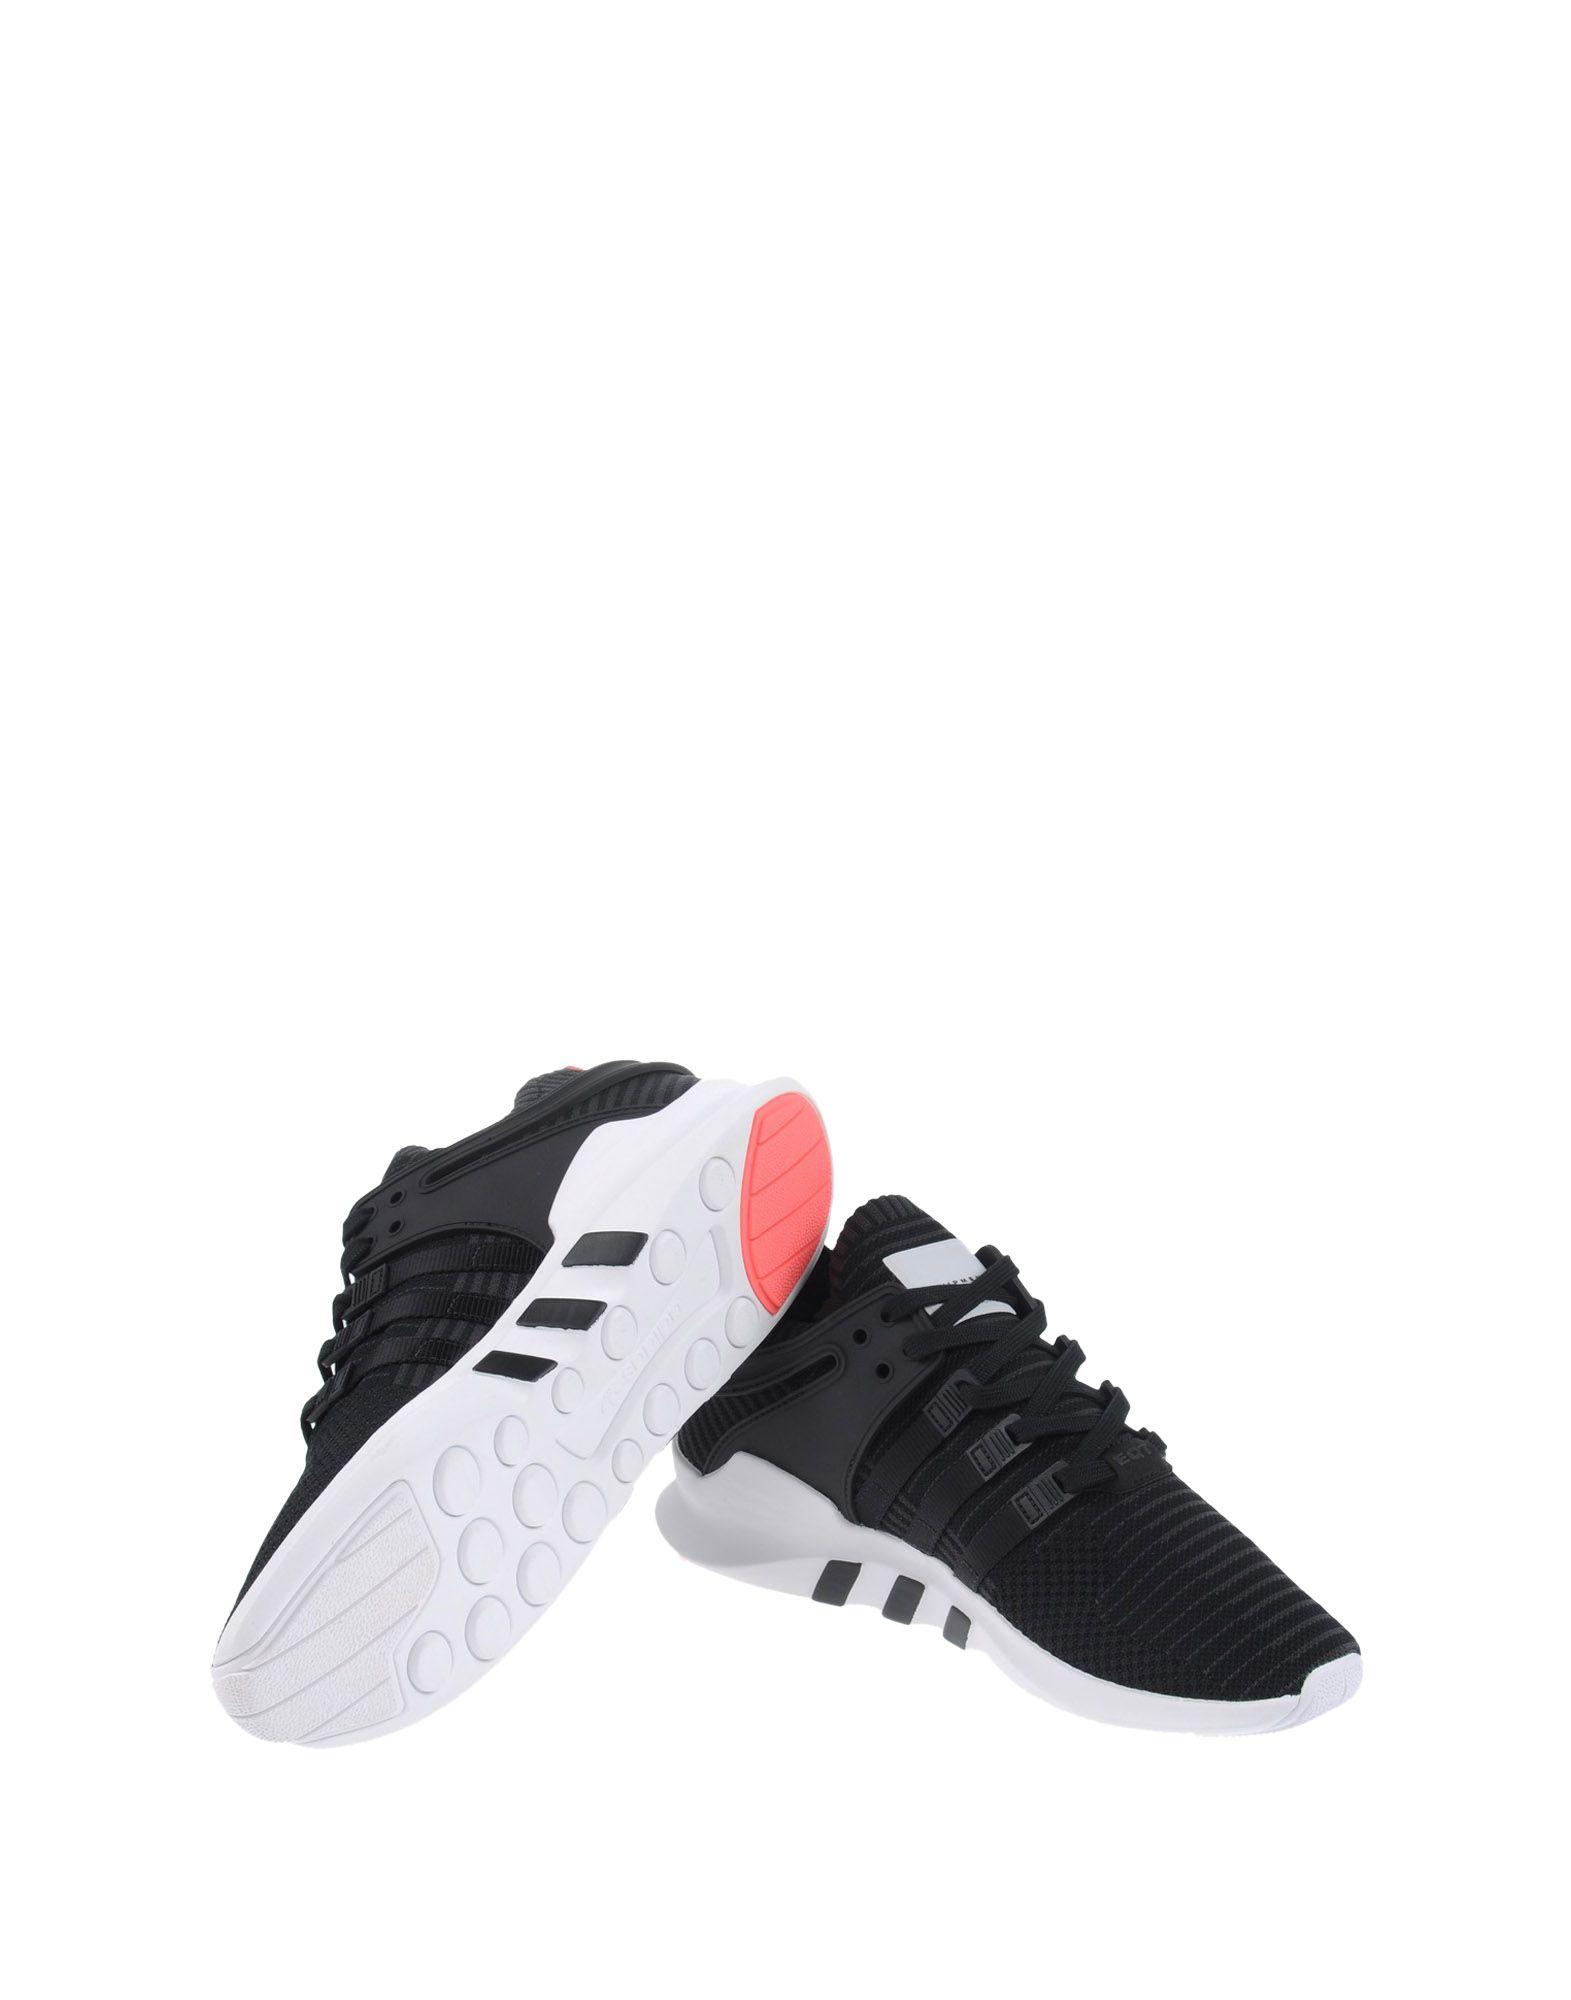 Adidas Originals Eqt Support Adv Pk  11193765AP Gute Qualität beliebte Schuhe